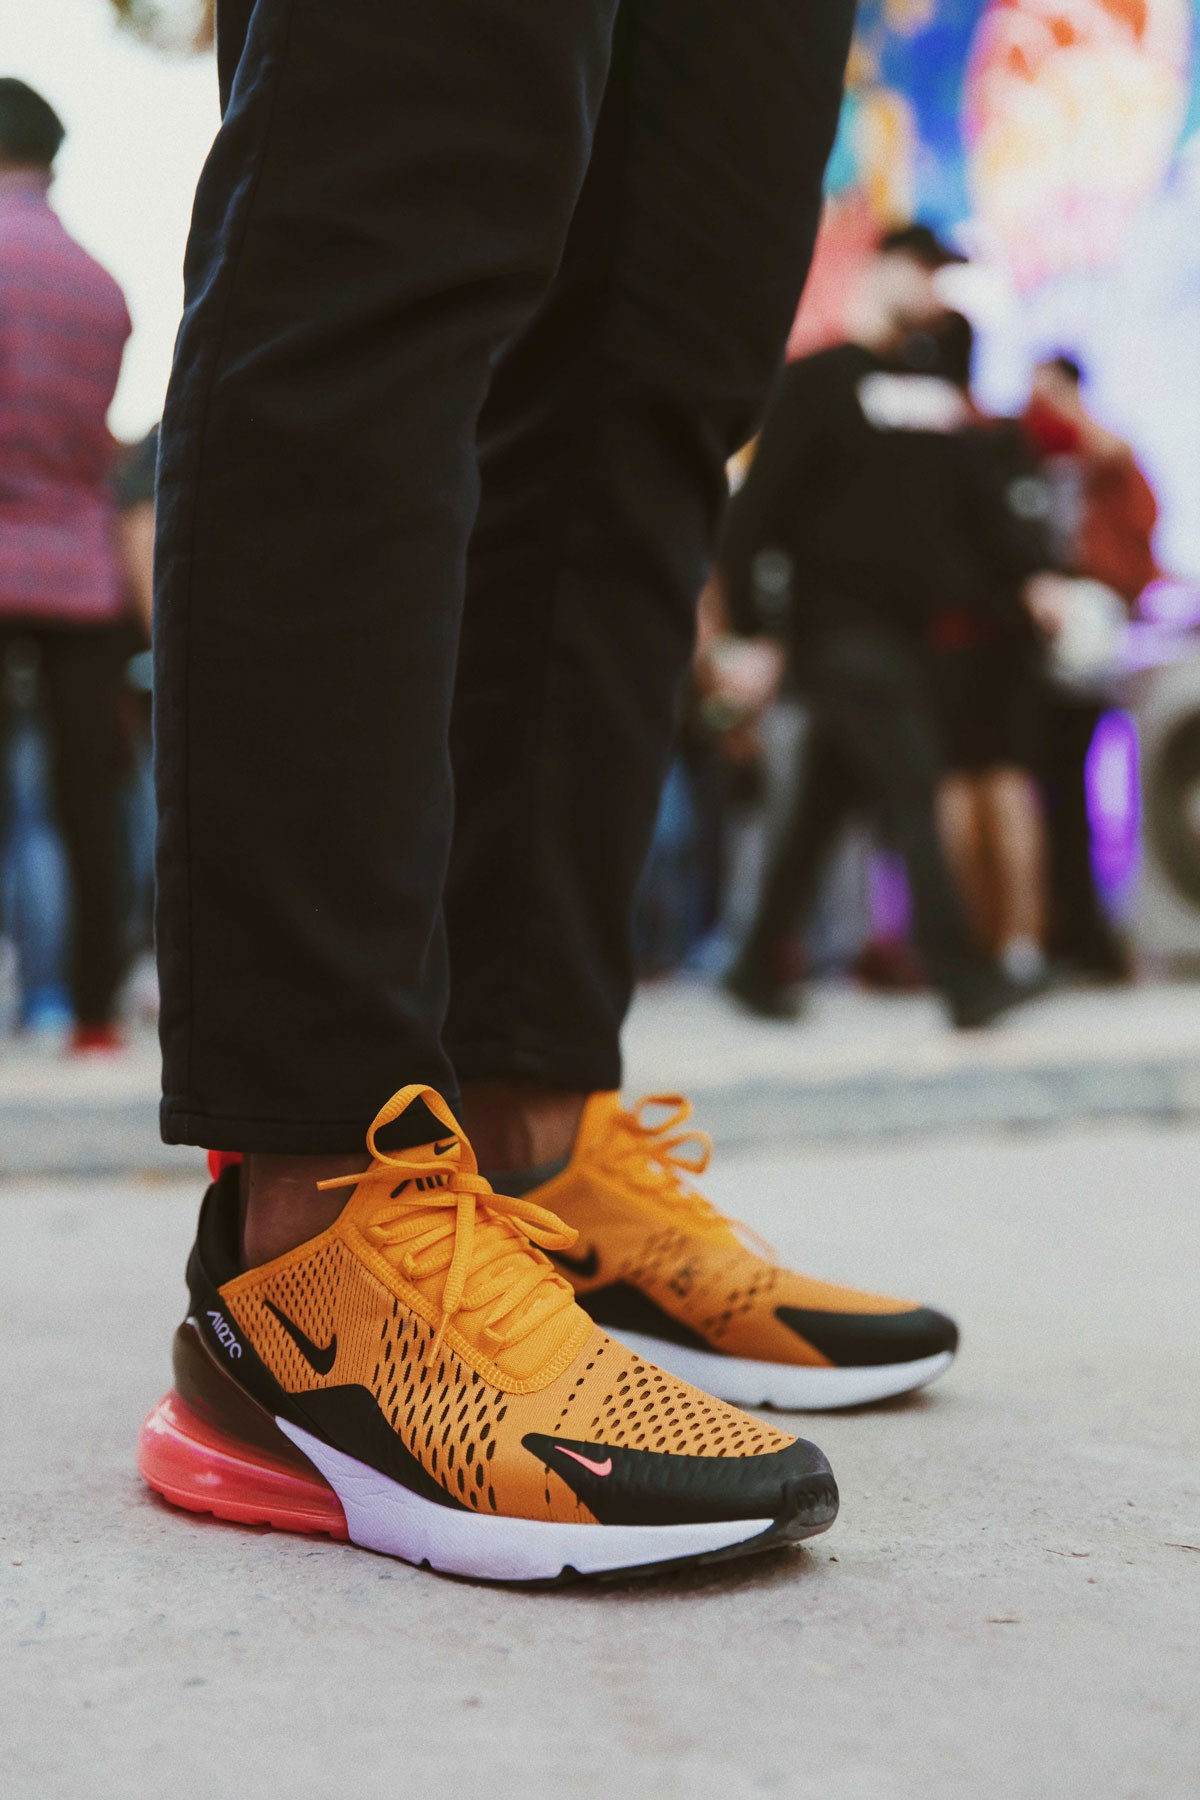 india indian sneakerhead sneakers shoes footwear mumbai bombay new dehli nike adidias yeezy boost originals air jordan air max day sneakercon